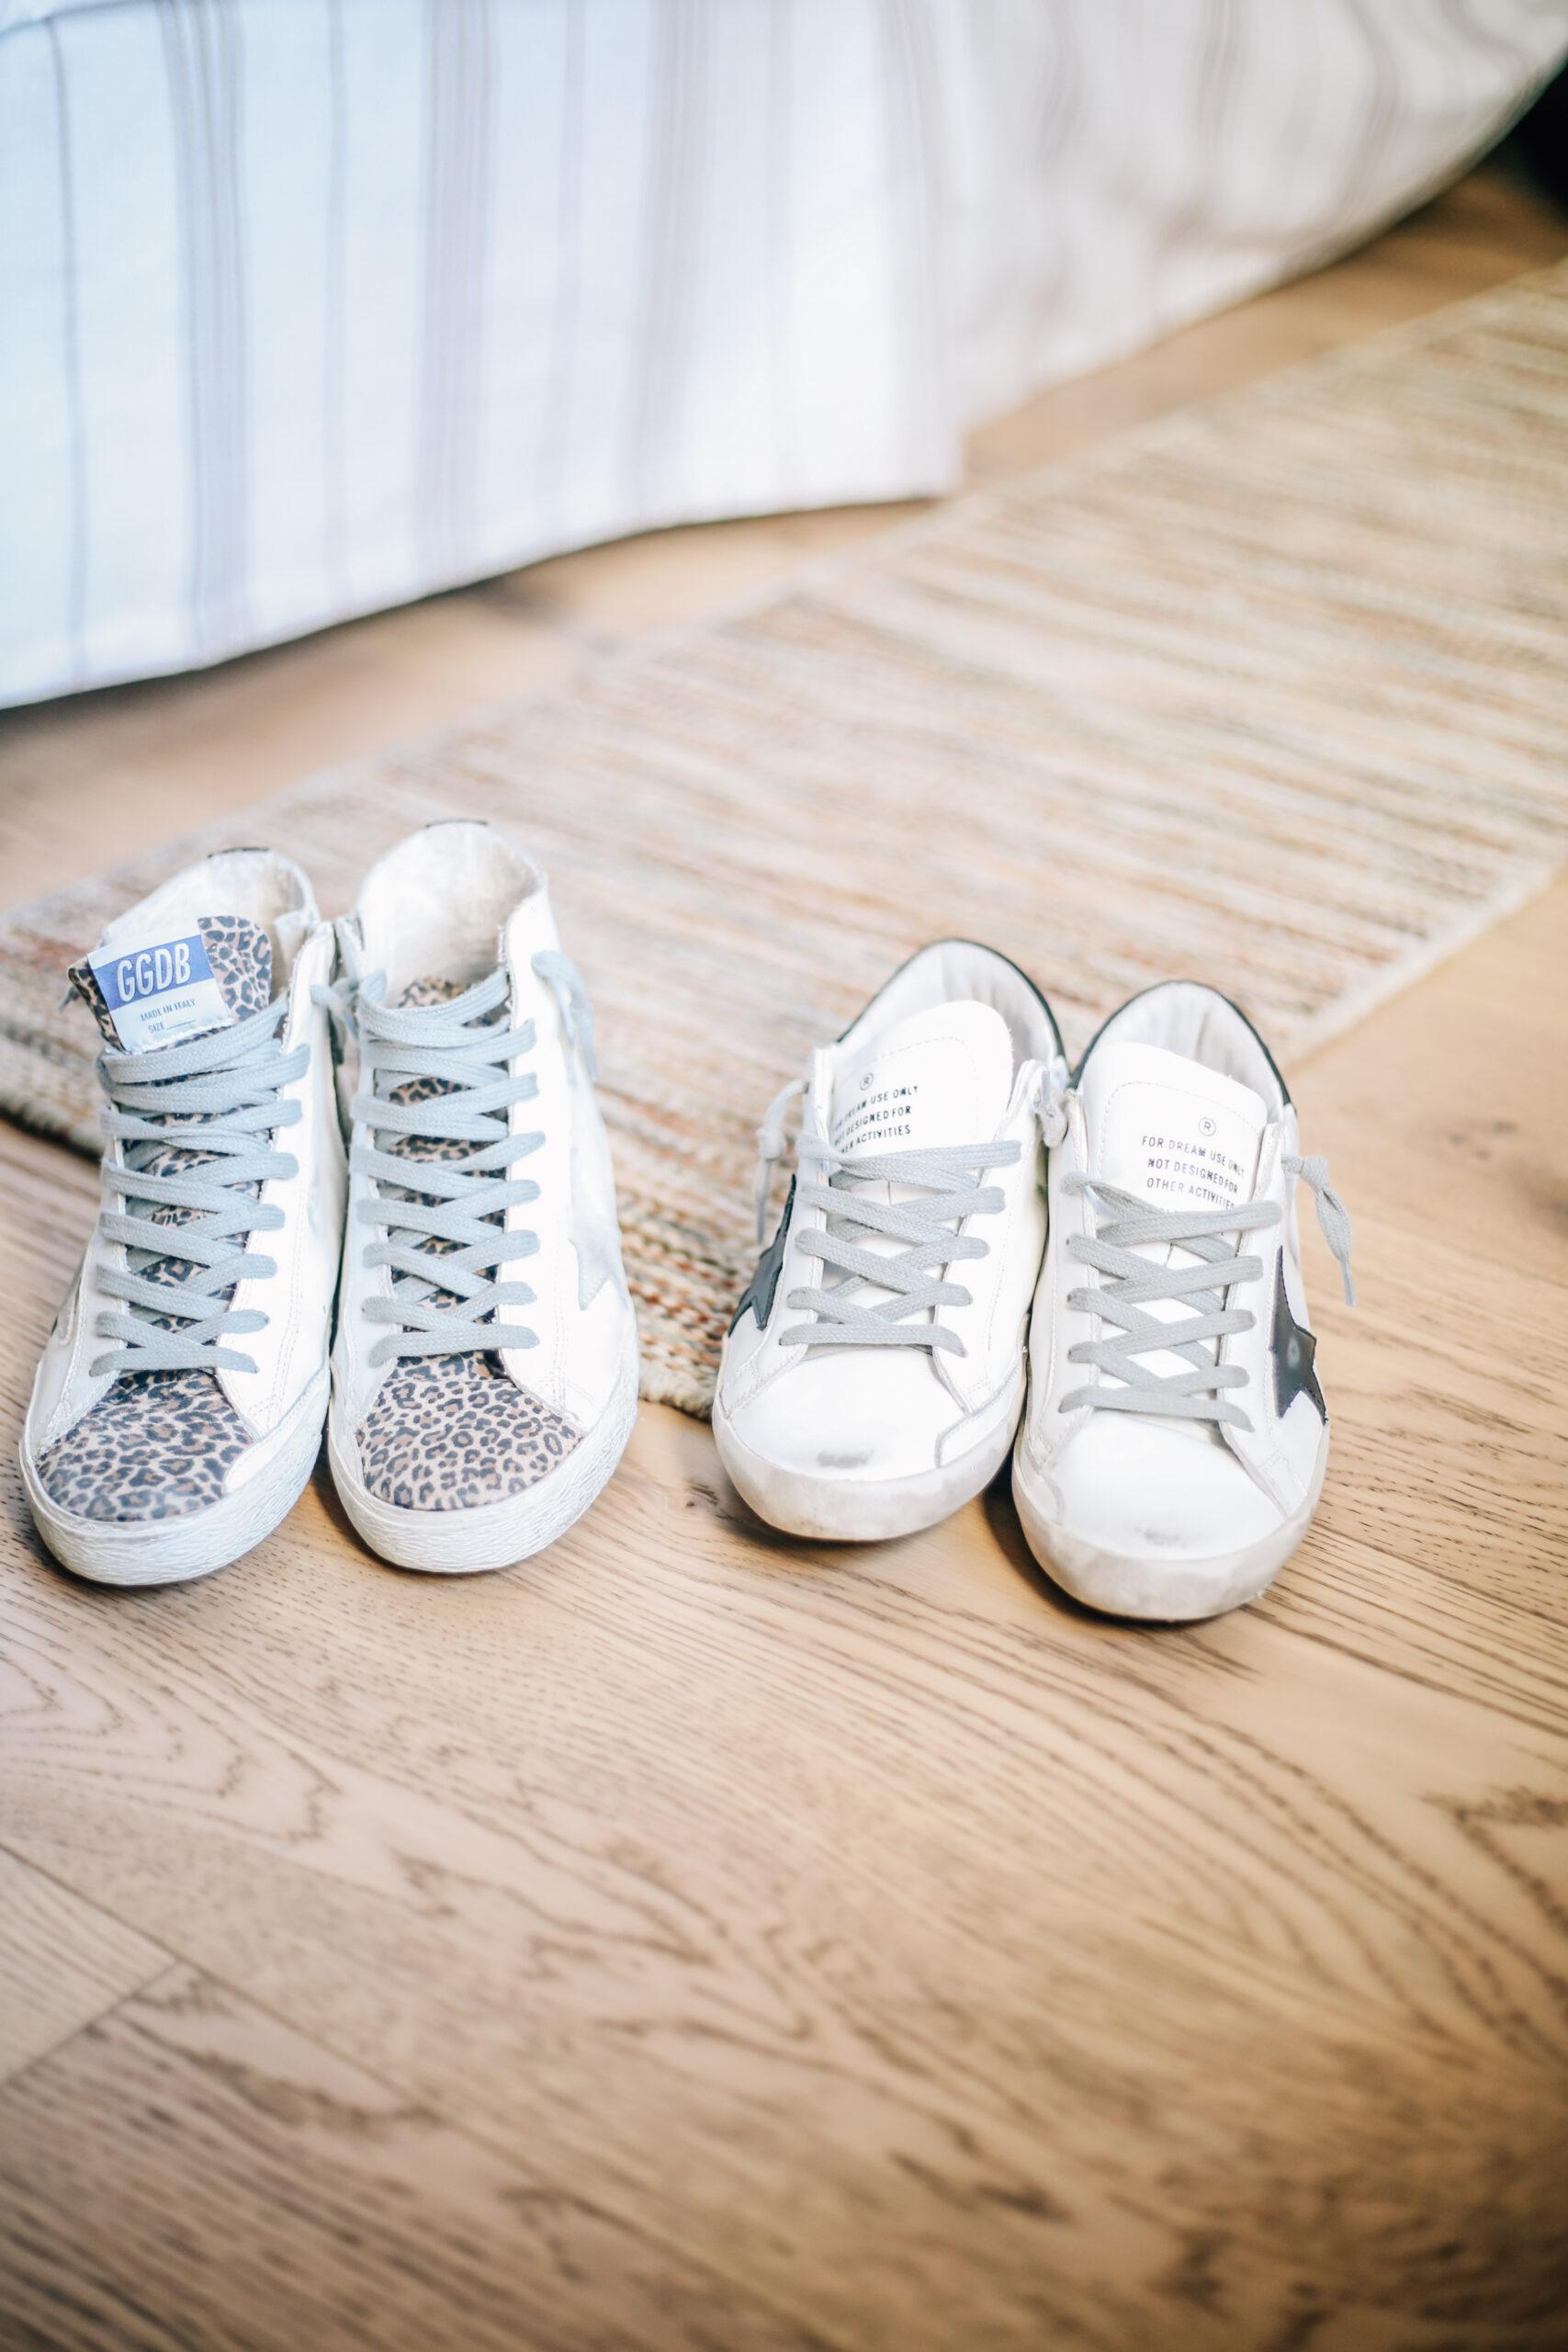 Tied Up Knit Dress SNDYS brand:SNDYS, Golden Goose Sale, Golden Goose Review, Golden Goose Sneakers